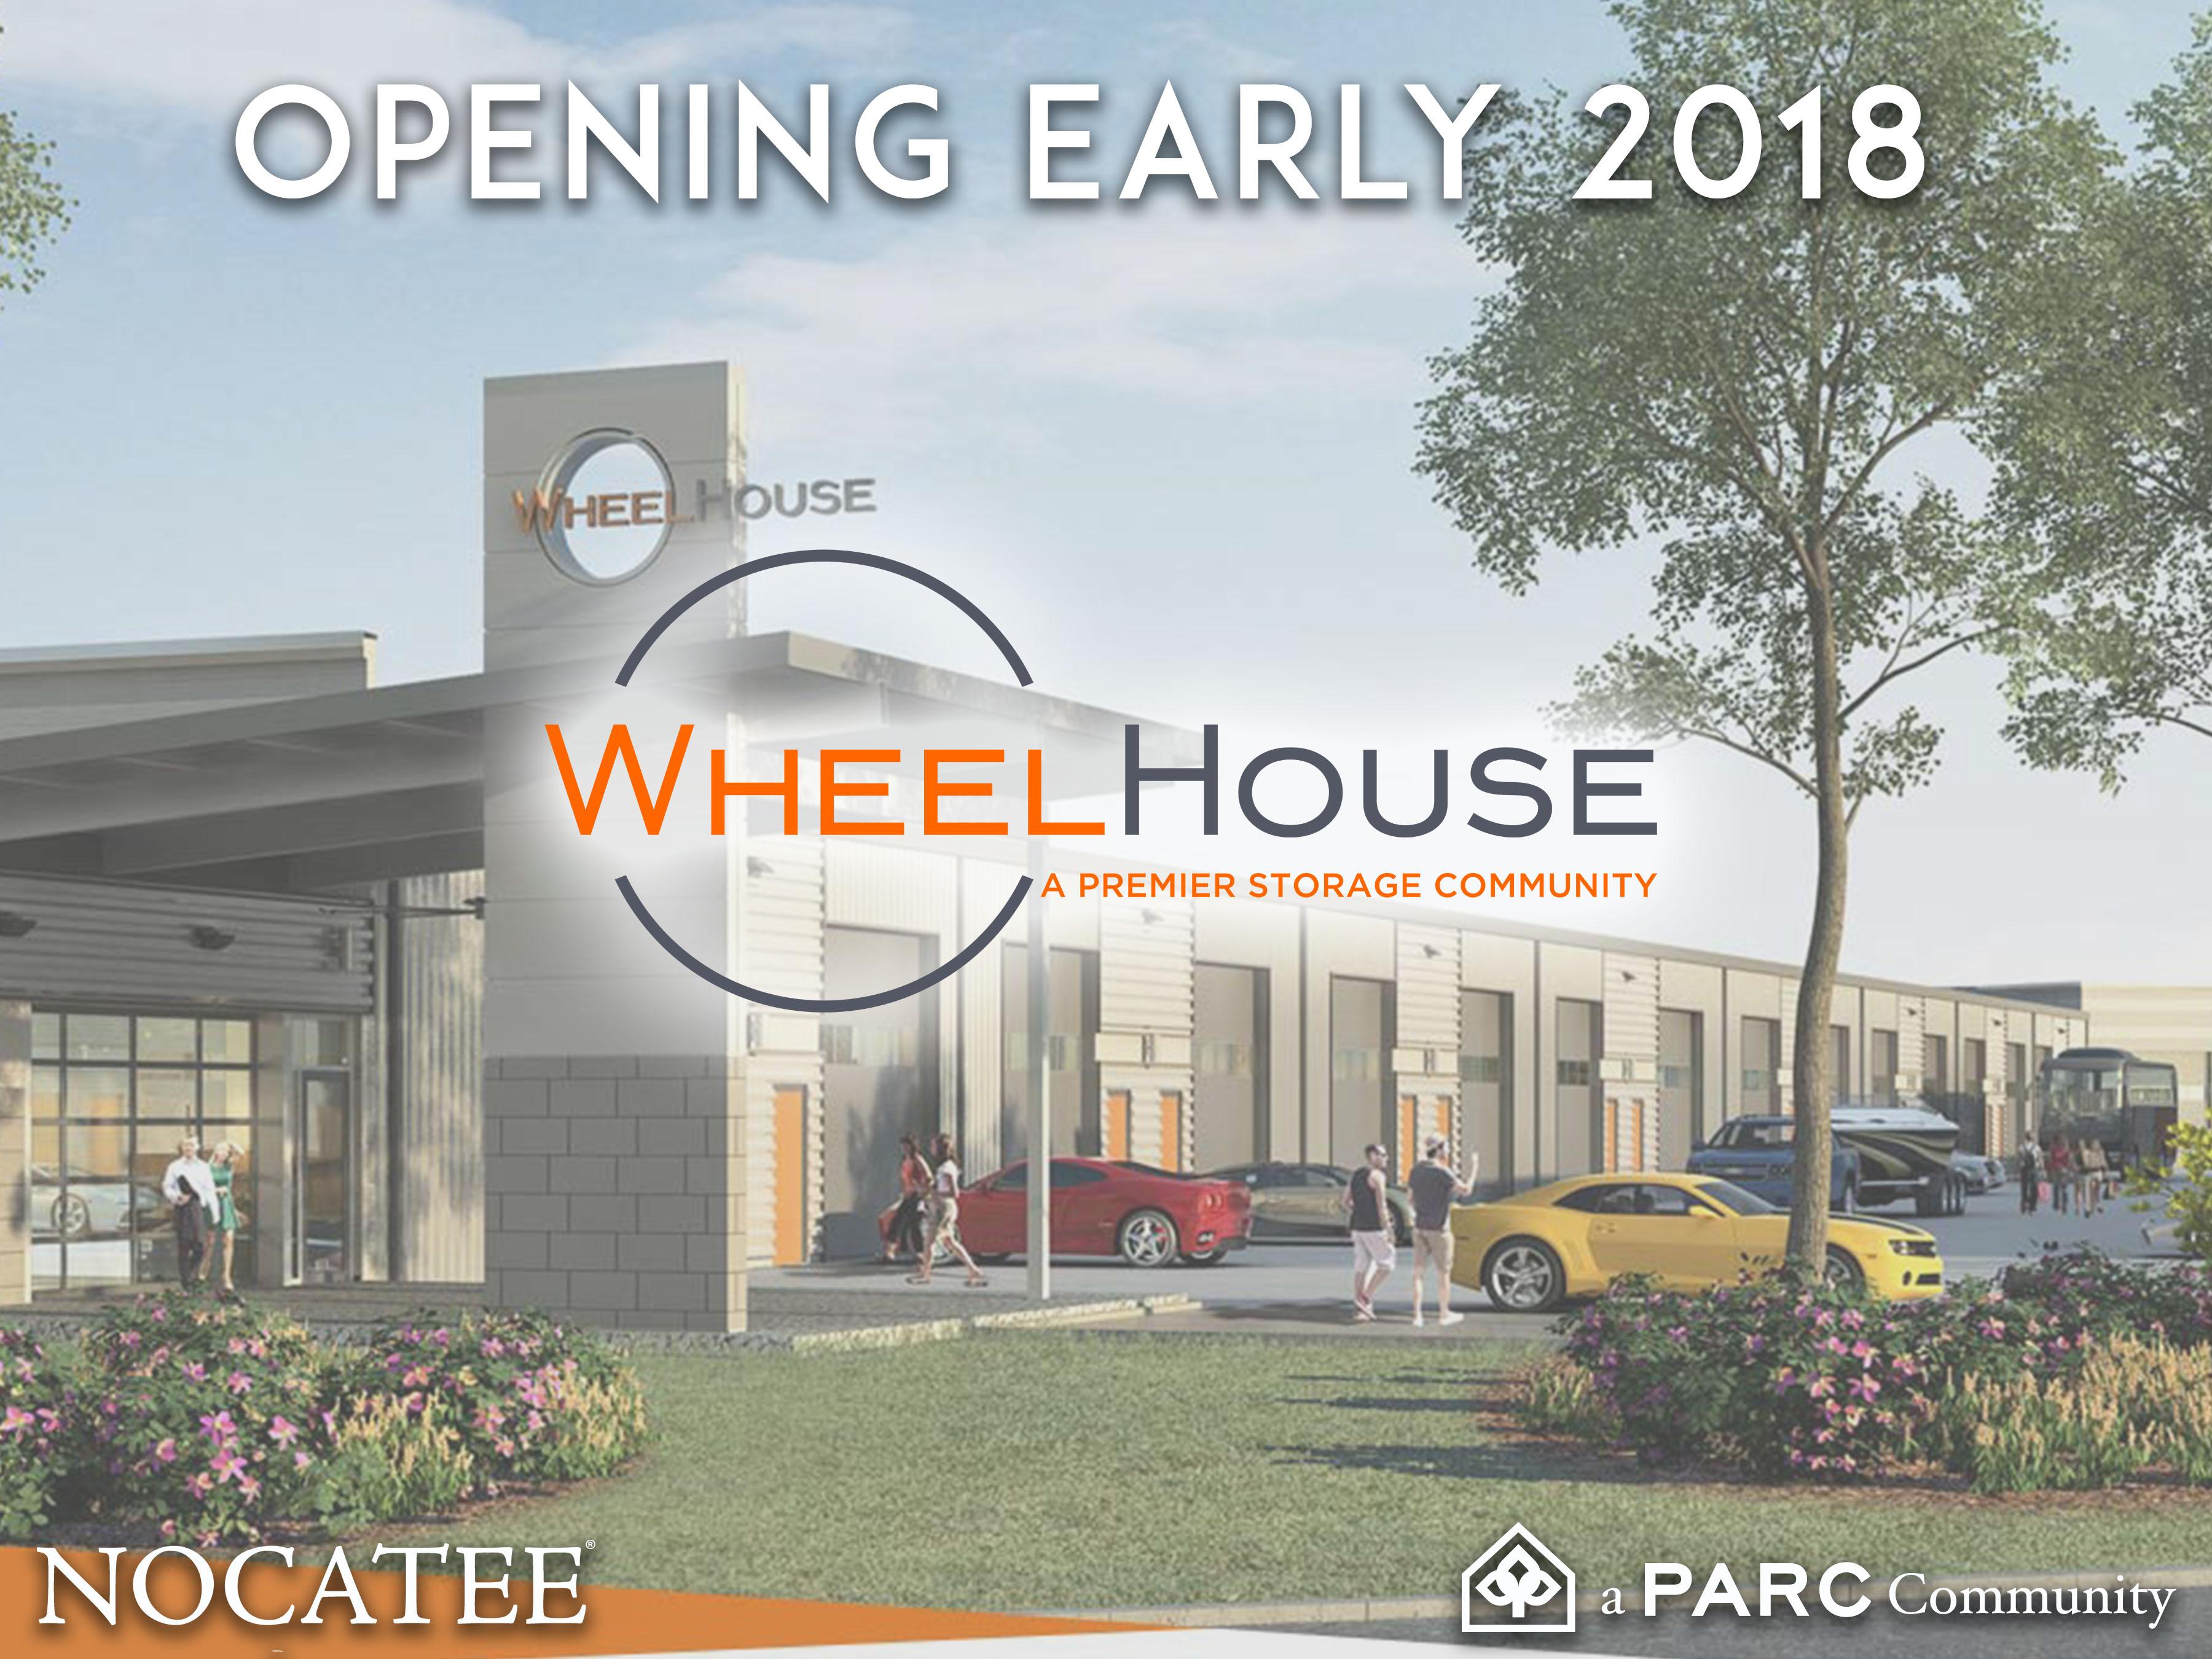 WheelHouse Storage at Nocatee